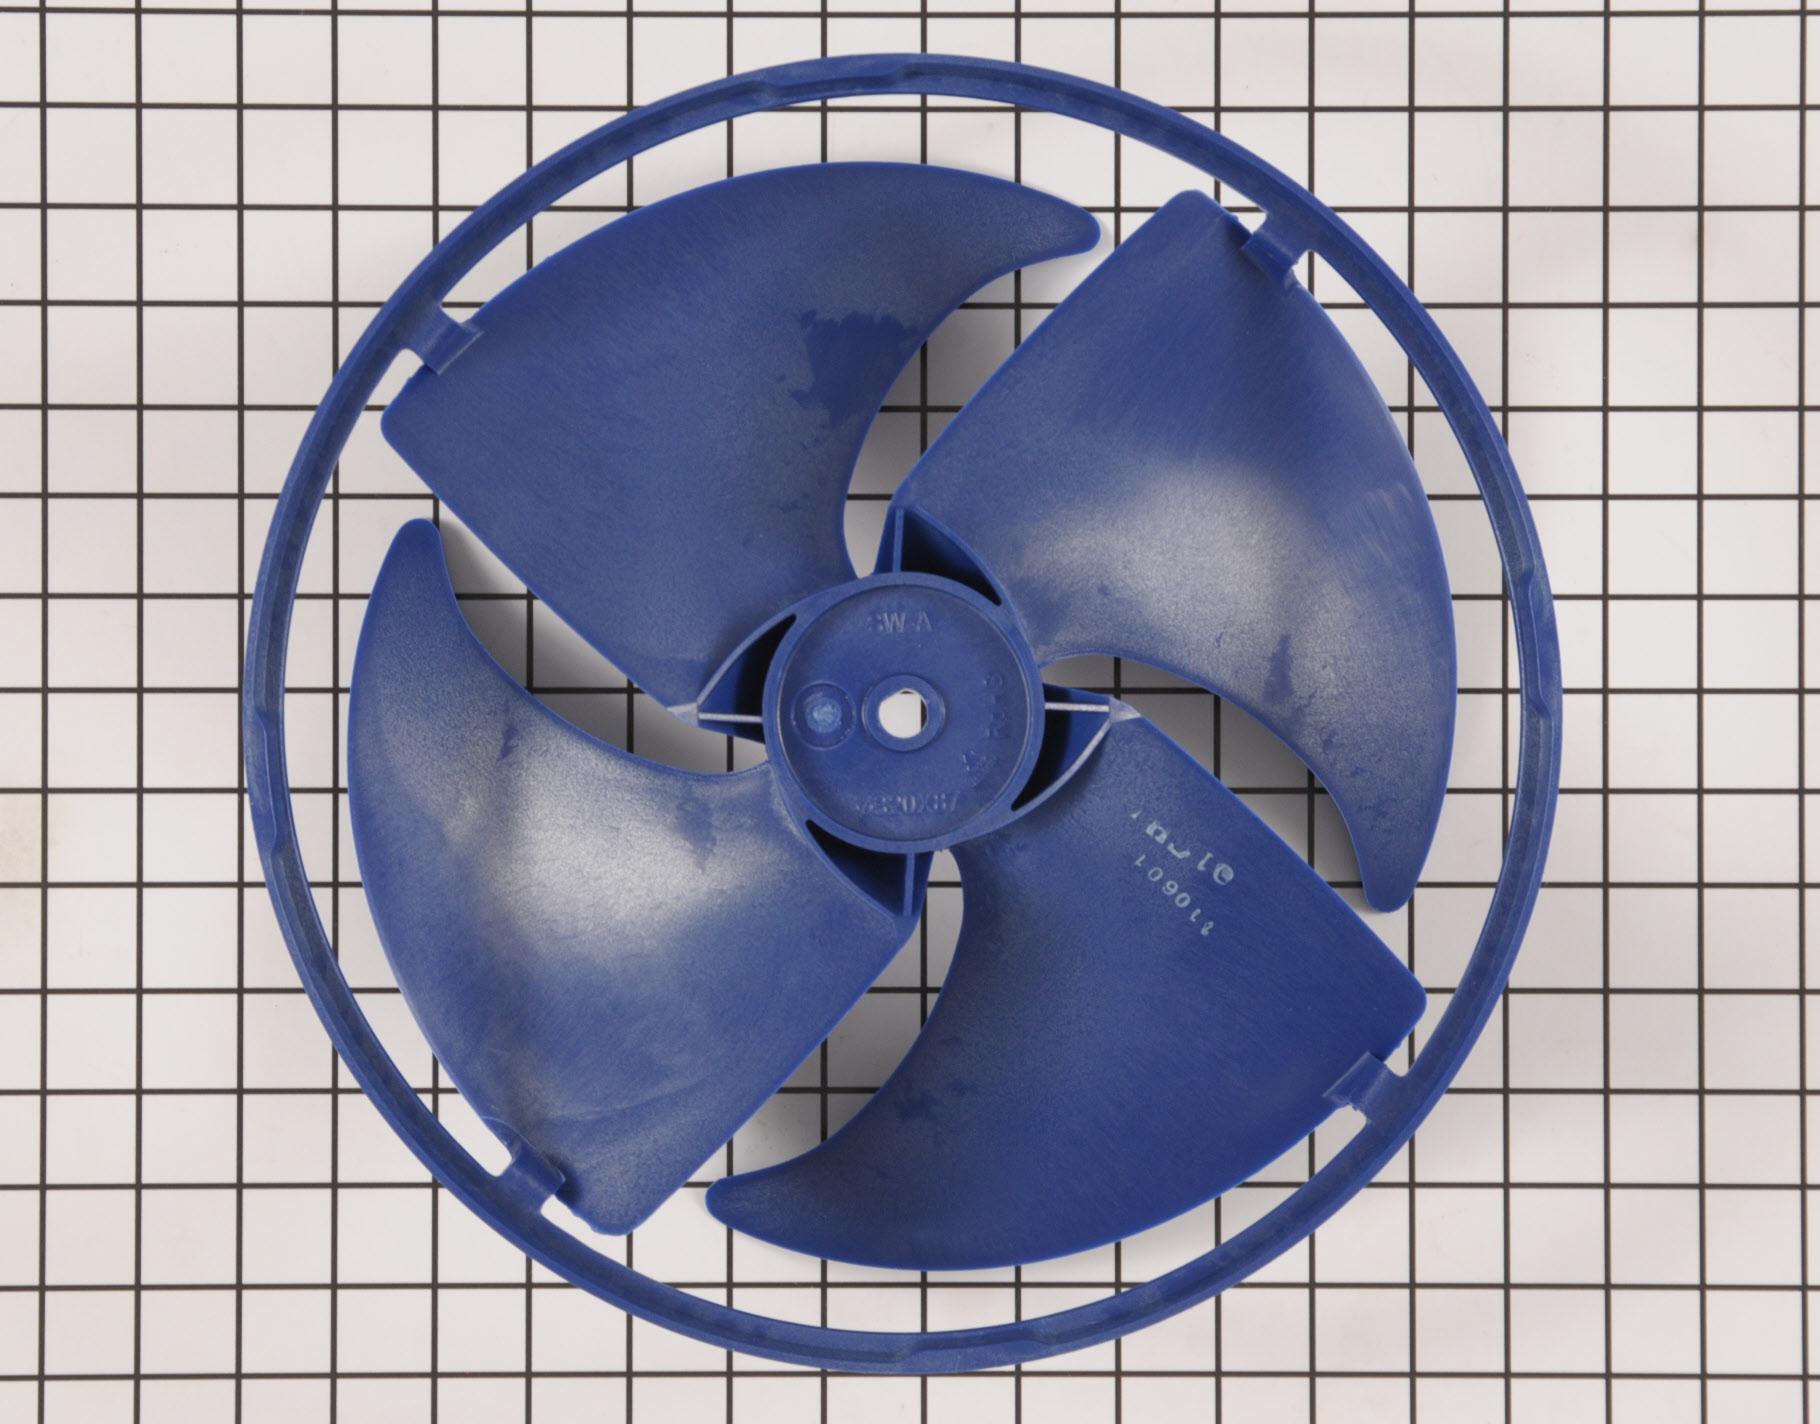 Kenmore Air Conditioner Part # 5304476059 - Fan Blade